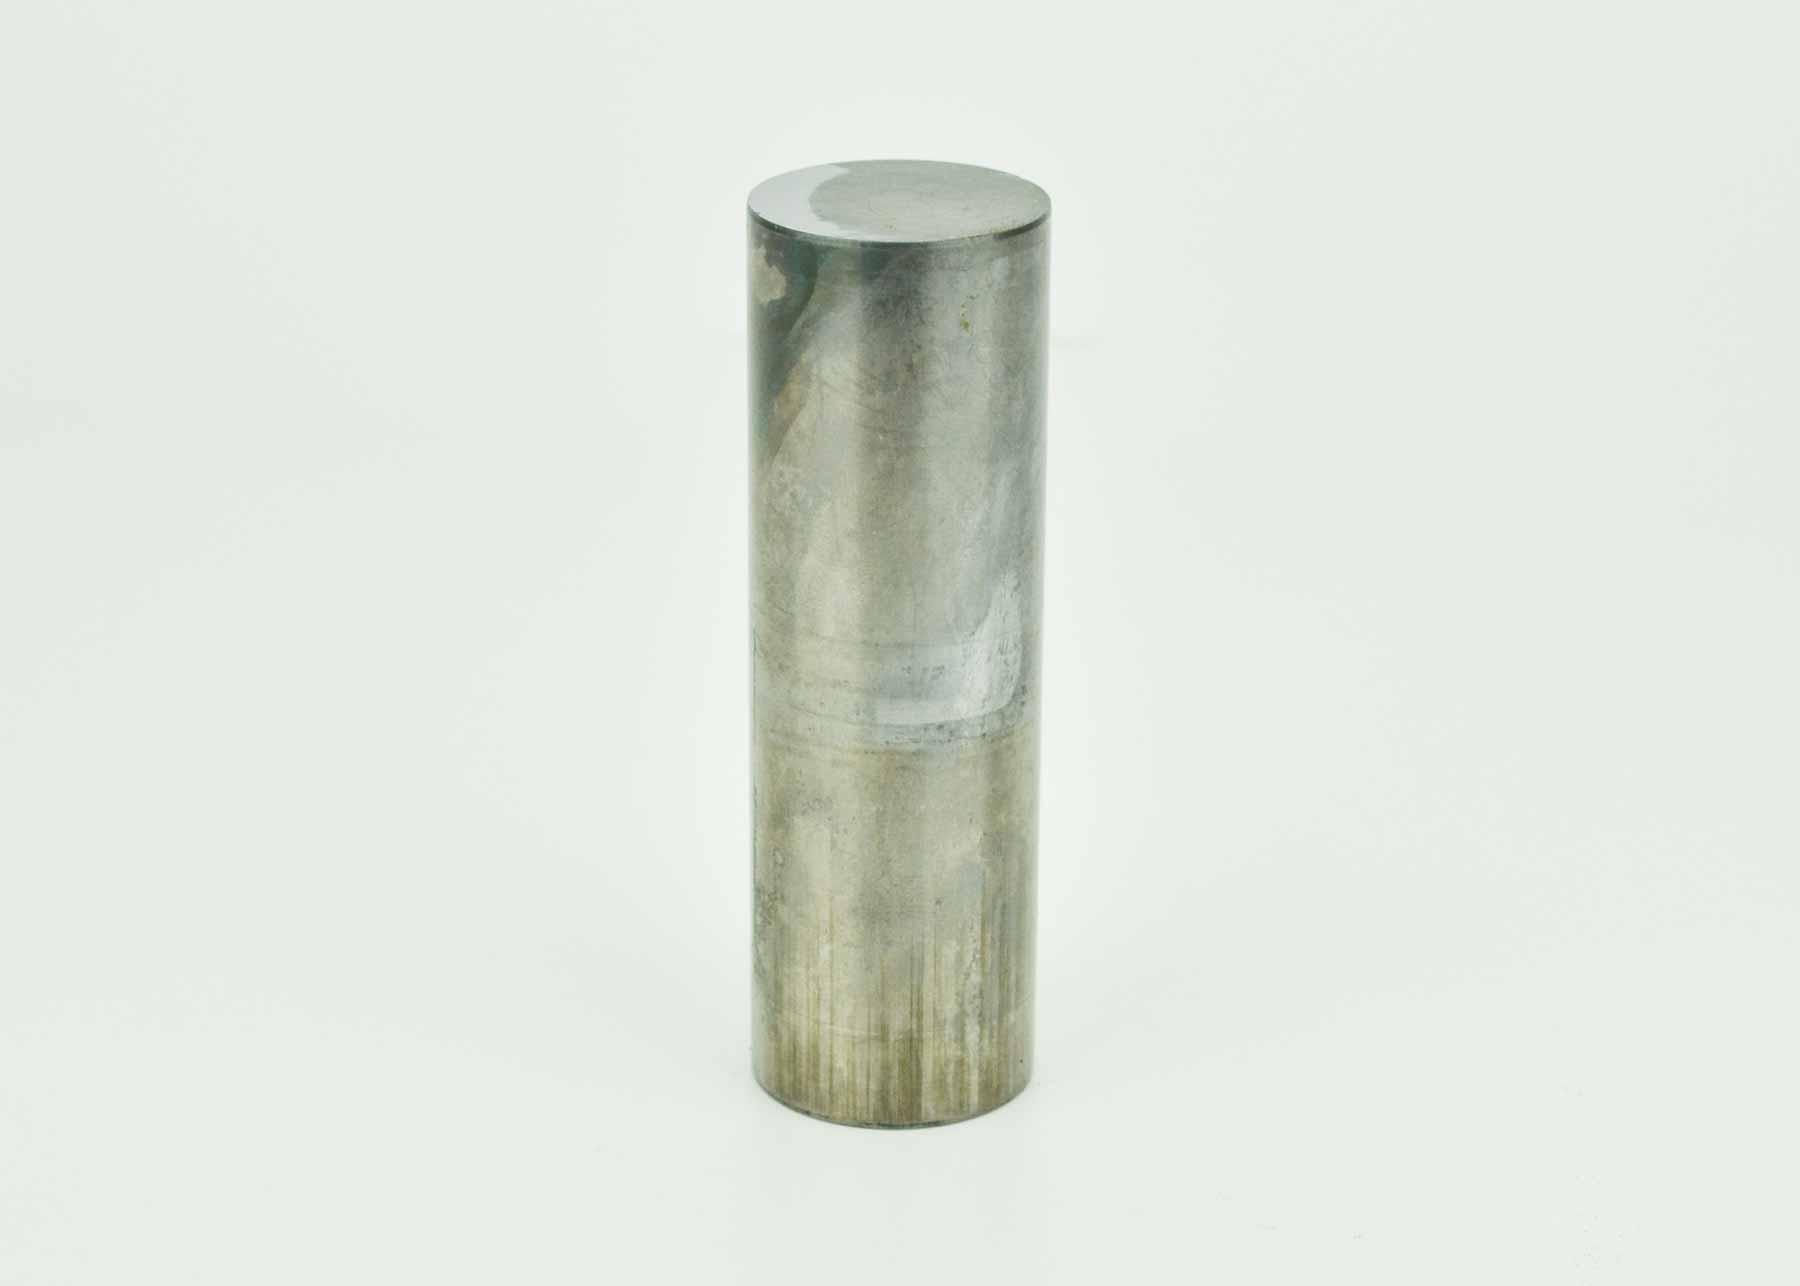 Viking® LL Tungsten Carbide Idler Pin 2-436-005-765-00